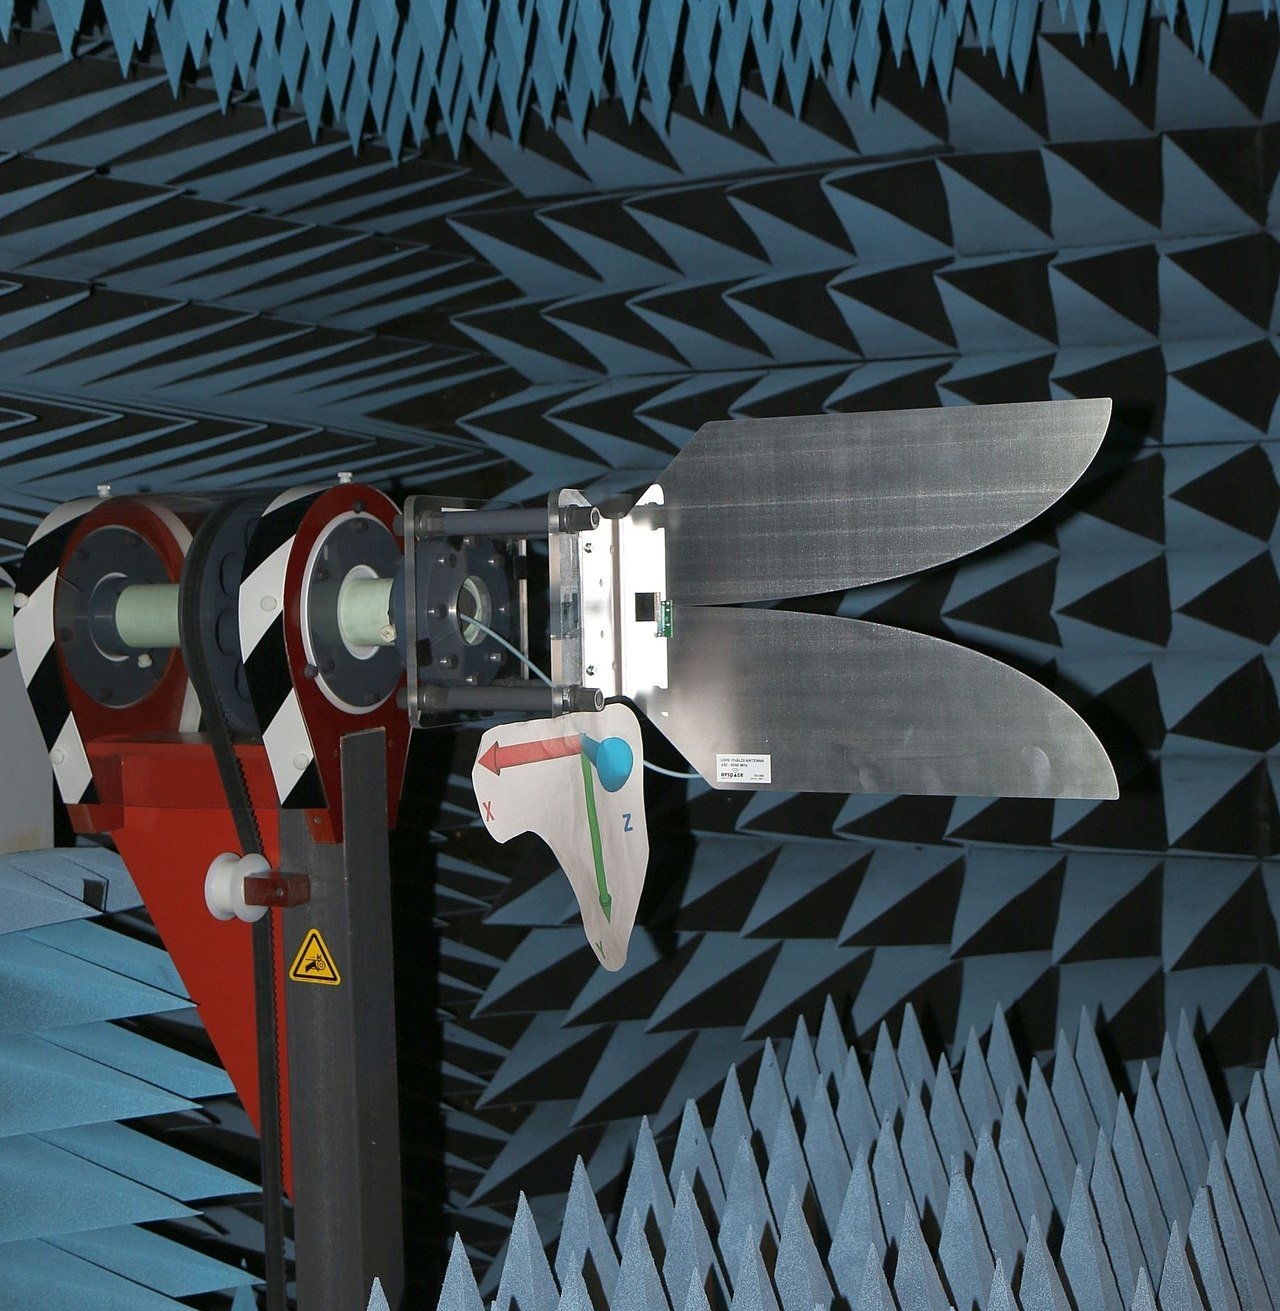 1280px-Vivaldi-Antenna-Testing-In-Chamber.jpg